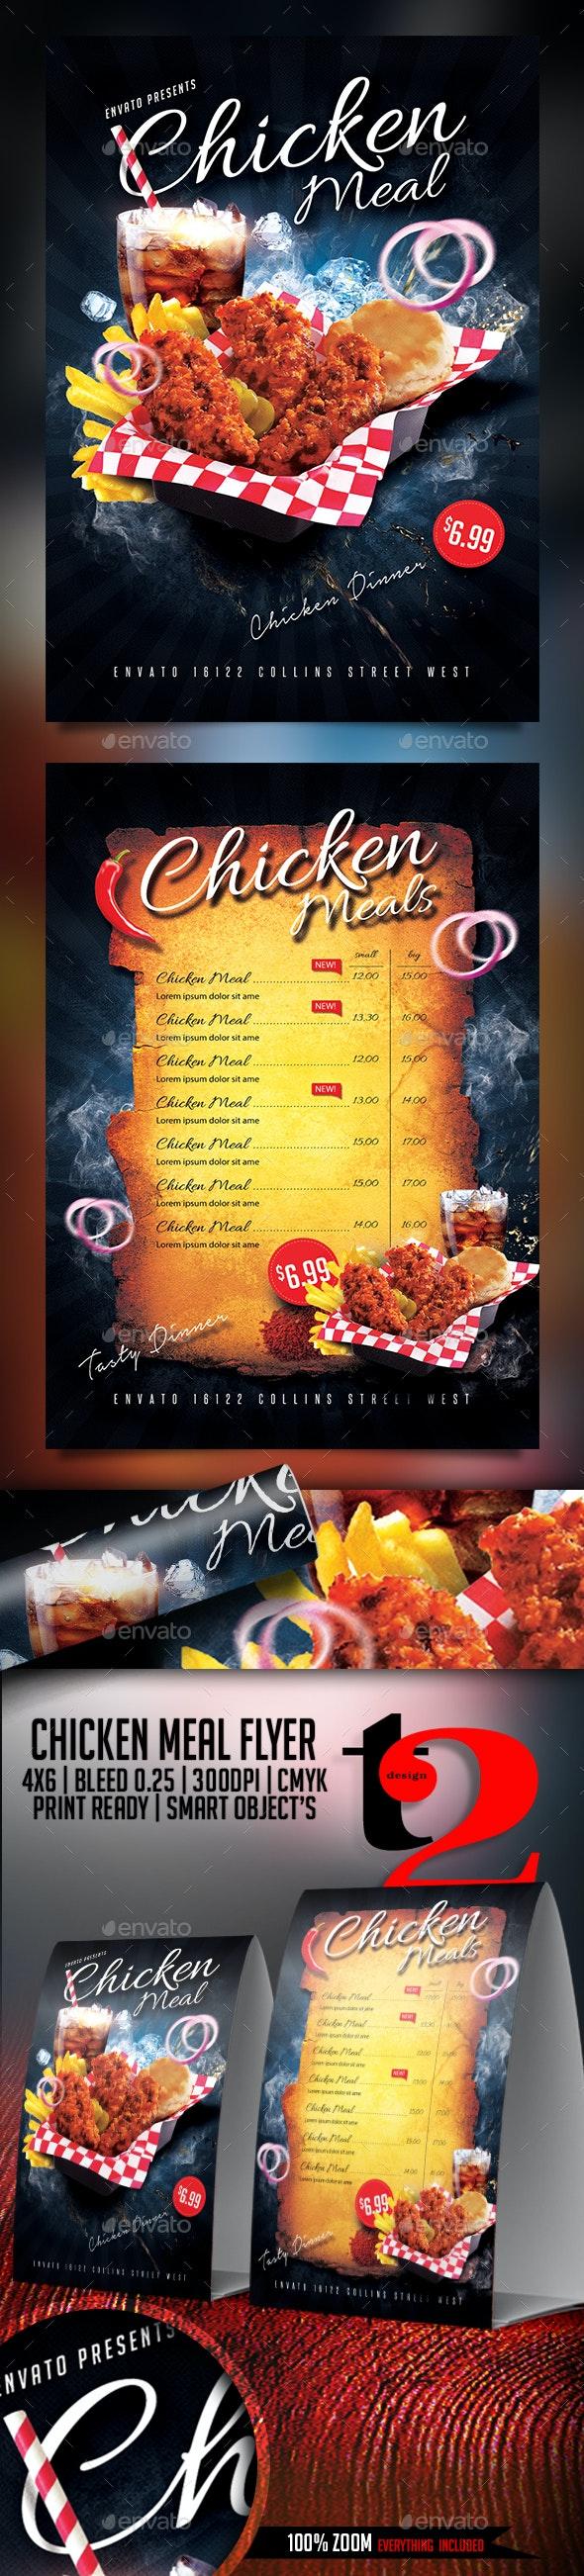 Chicken Meal Flyer Template - Restaurant Flyers